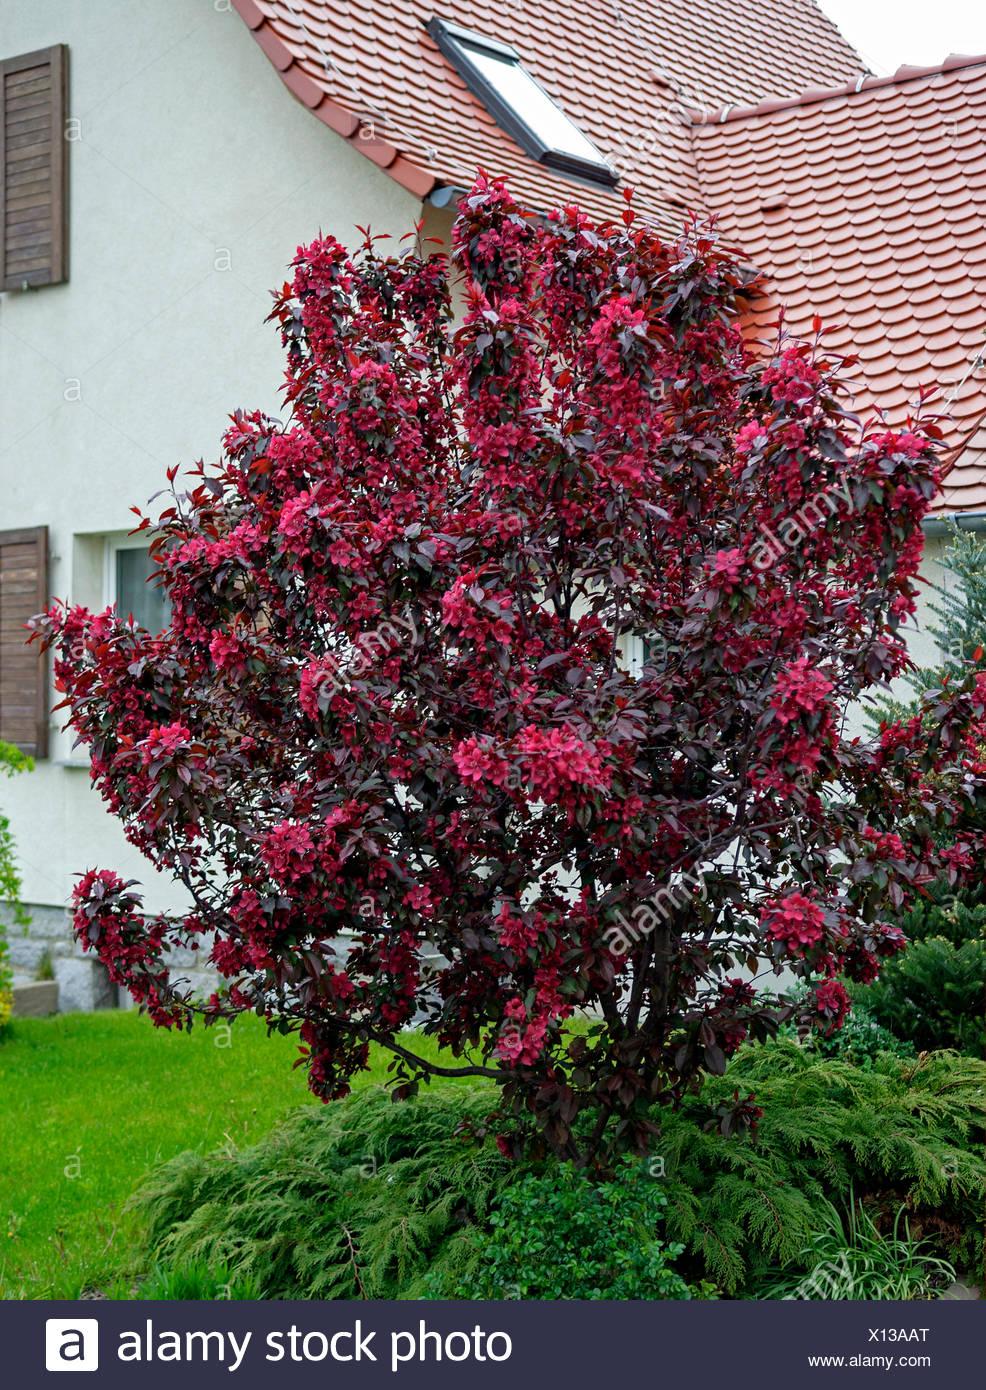 ornamental apple tree (Malus 'Royalty', Malus Royalty), cultiar Royalty, Germany Stock Photo